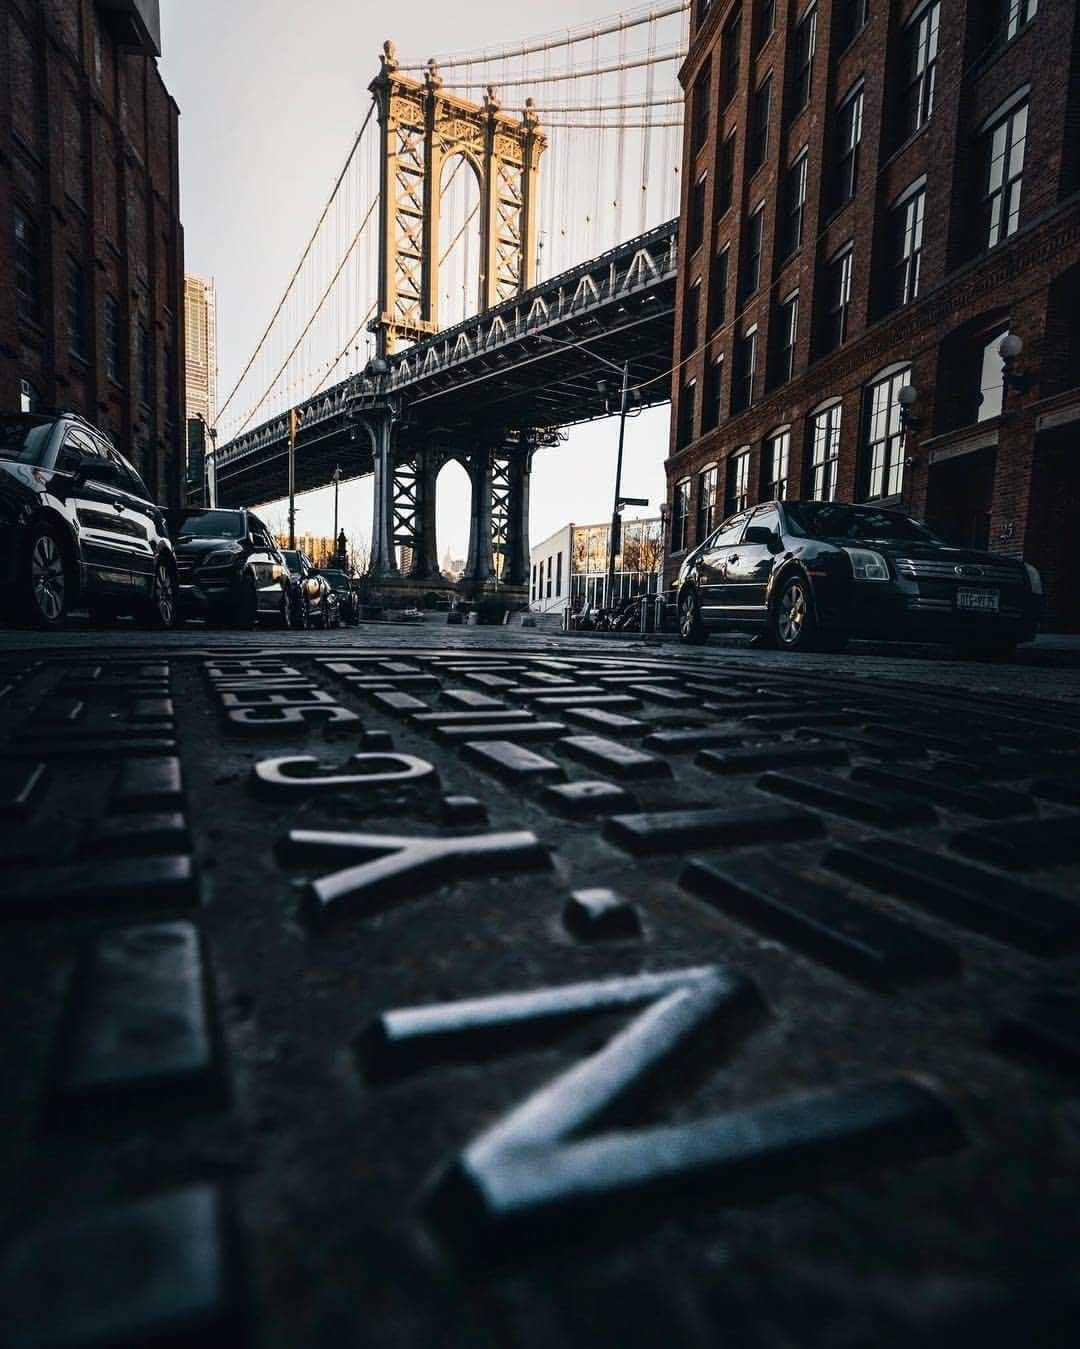 Brooklyn Staten Island Car: Nyc, New York I New York City